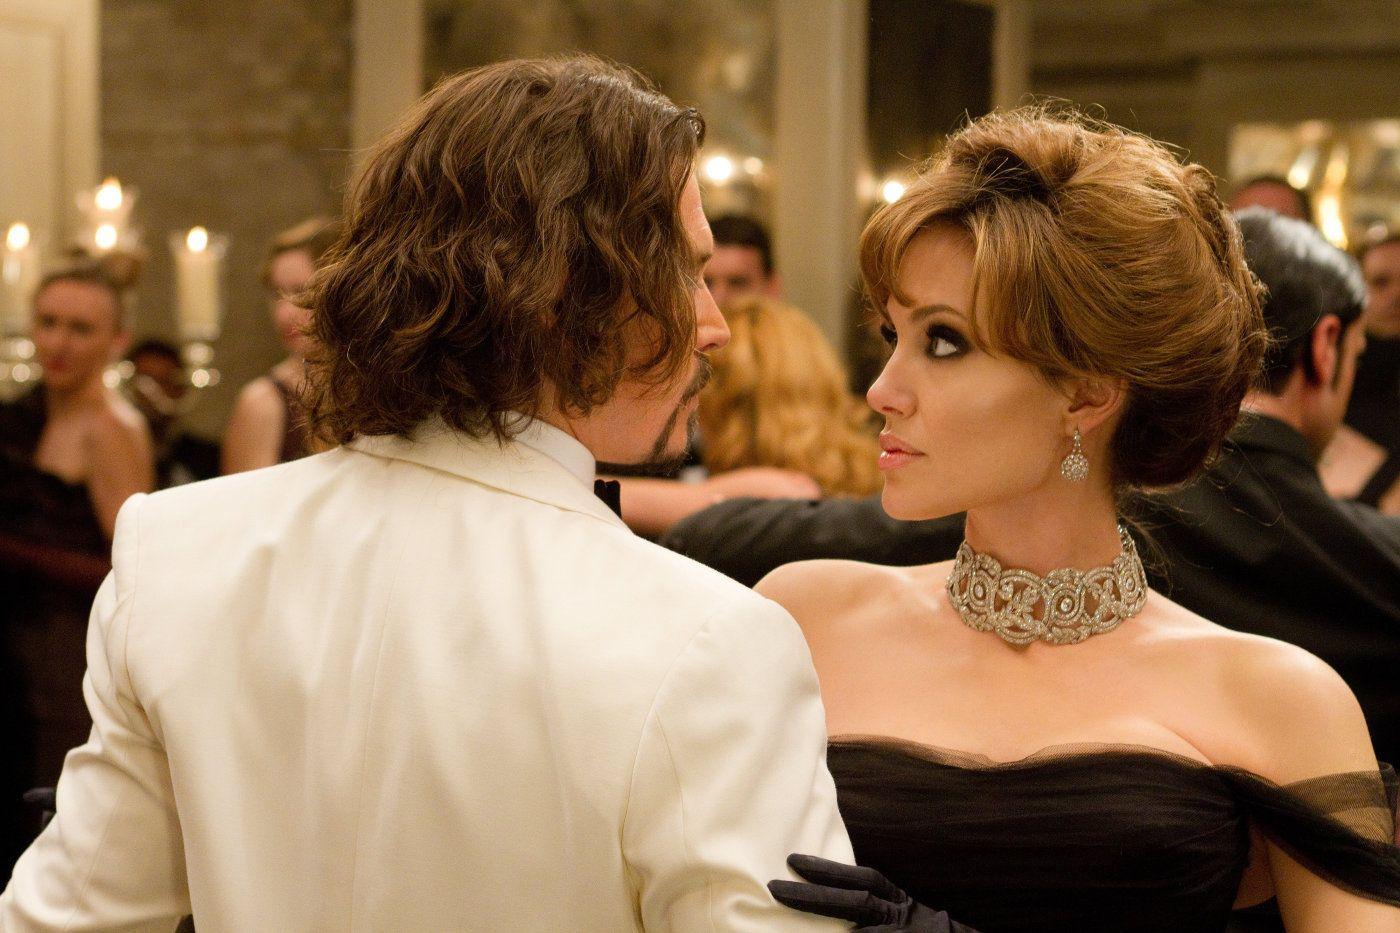 Angie S Rainbow The Tourist Gallery Angelina Jolie Johnny Depp The Tourist Movie